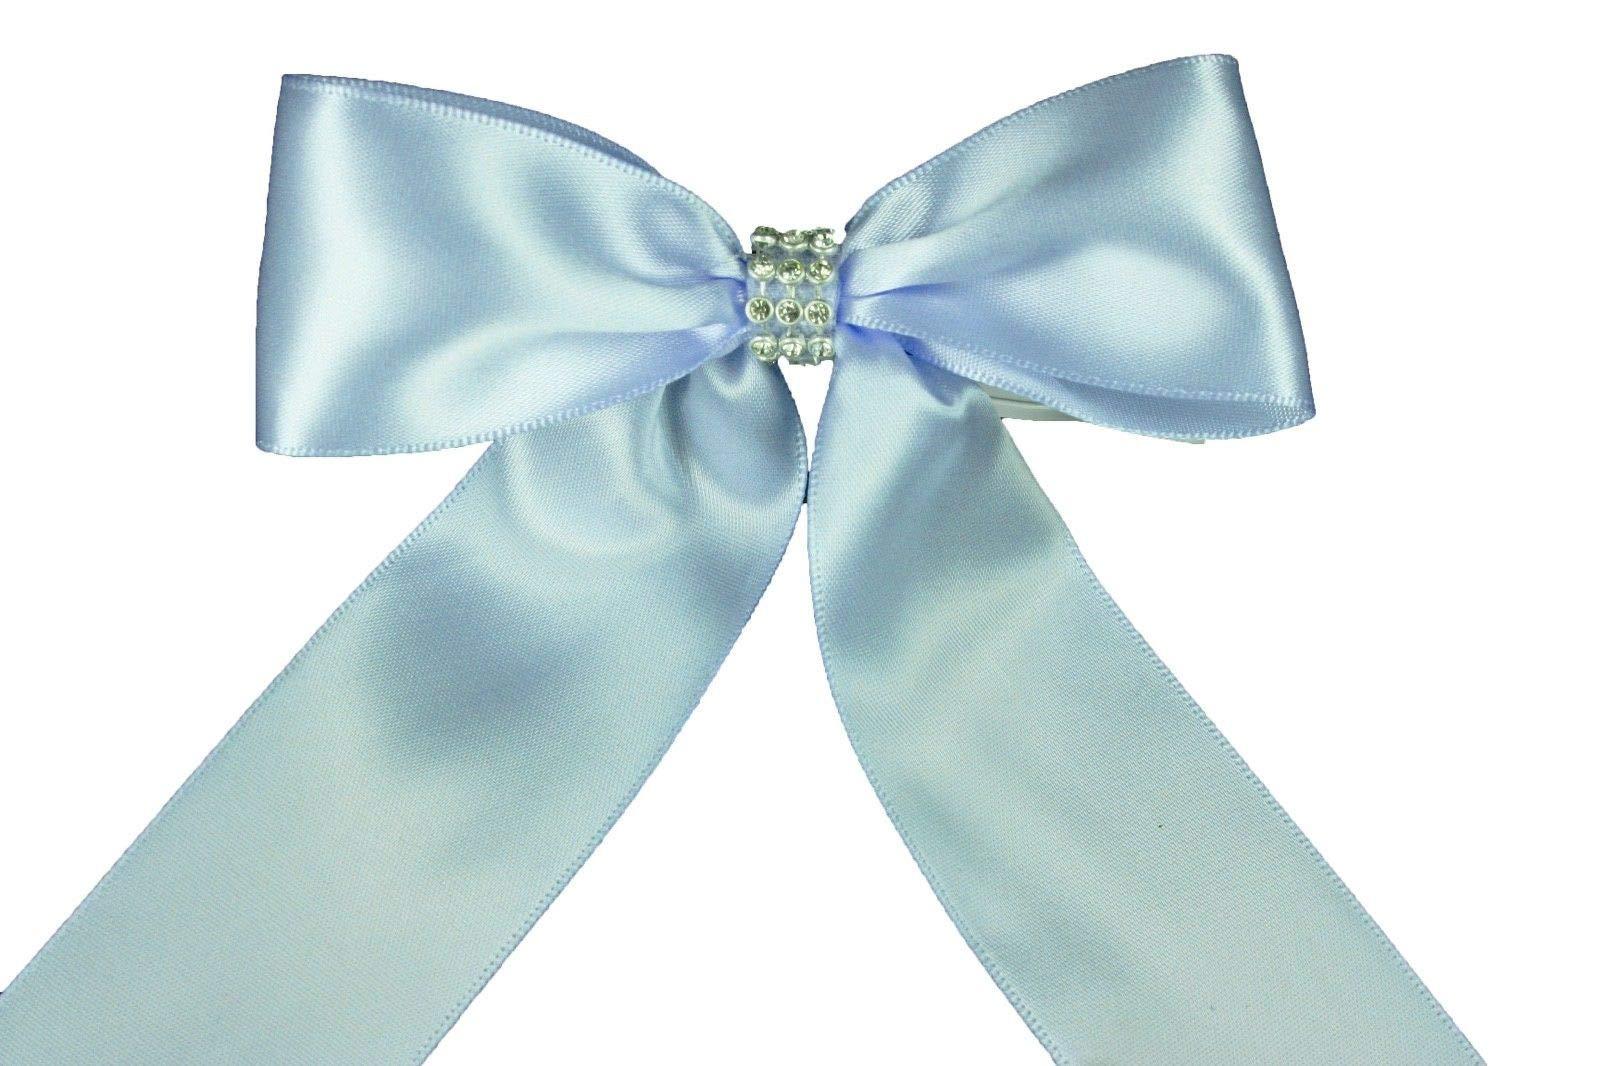 Light Blue (Set of 10) Pre-Made 1-1/2'' Satin Bows Rhinestone Center Design with Wire Tie #DPNH